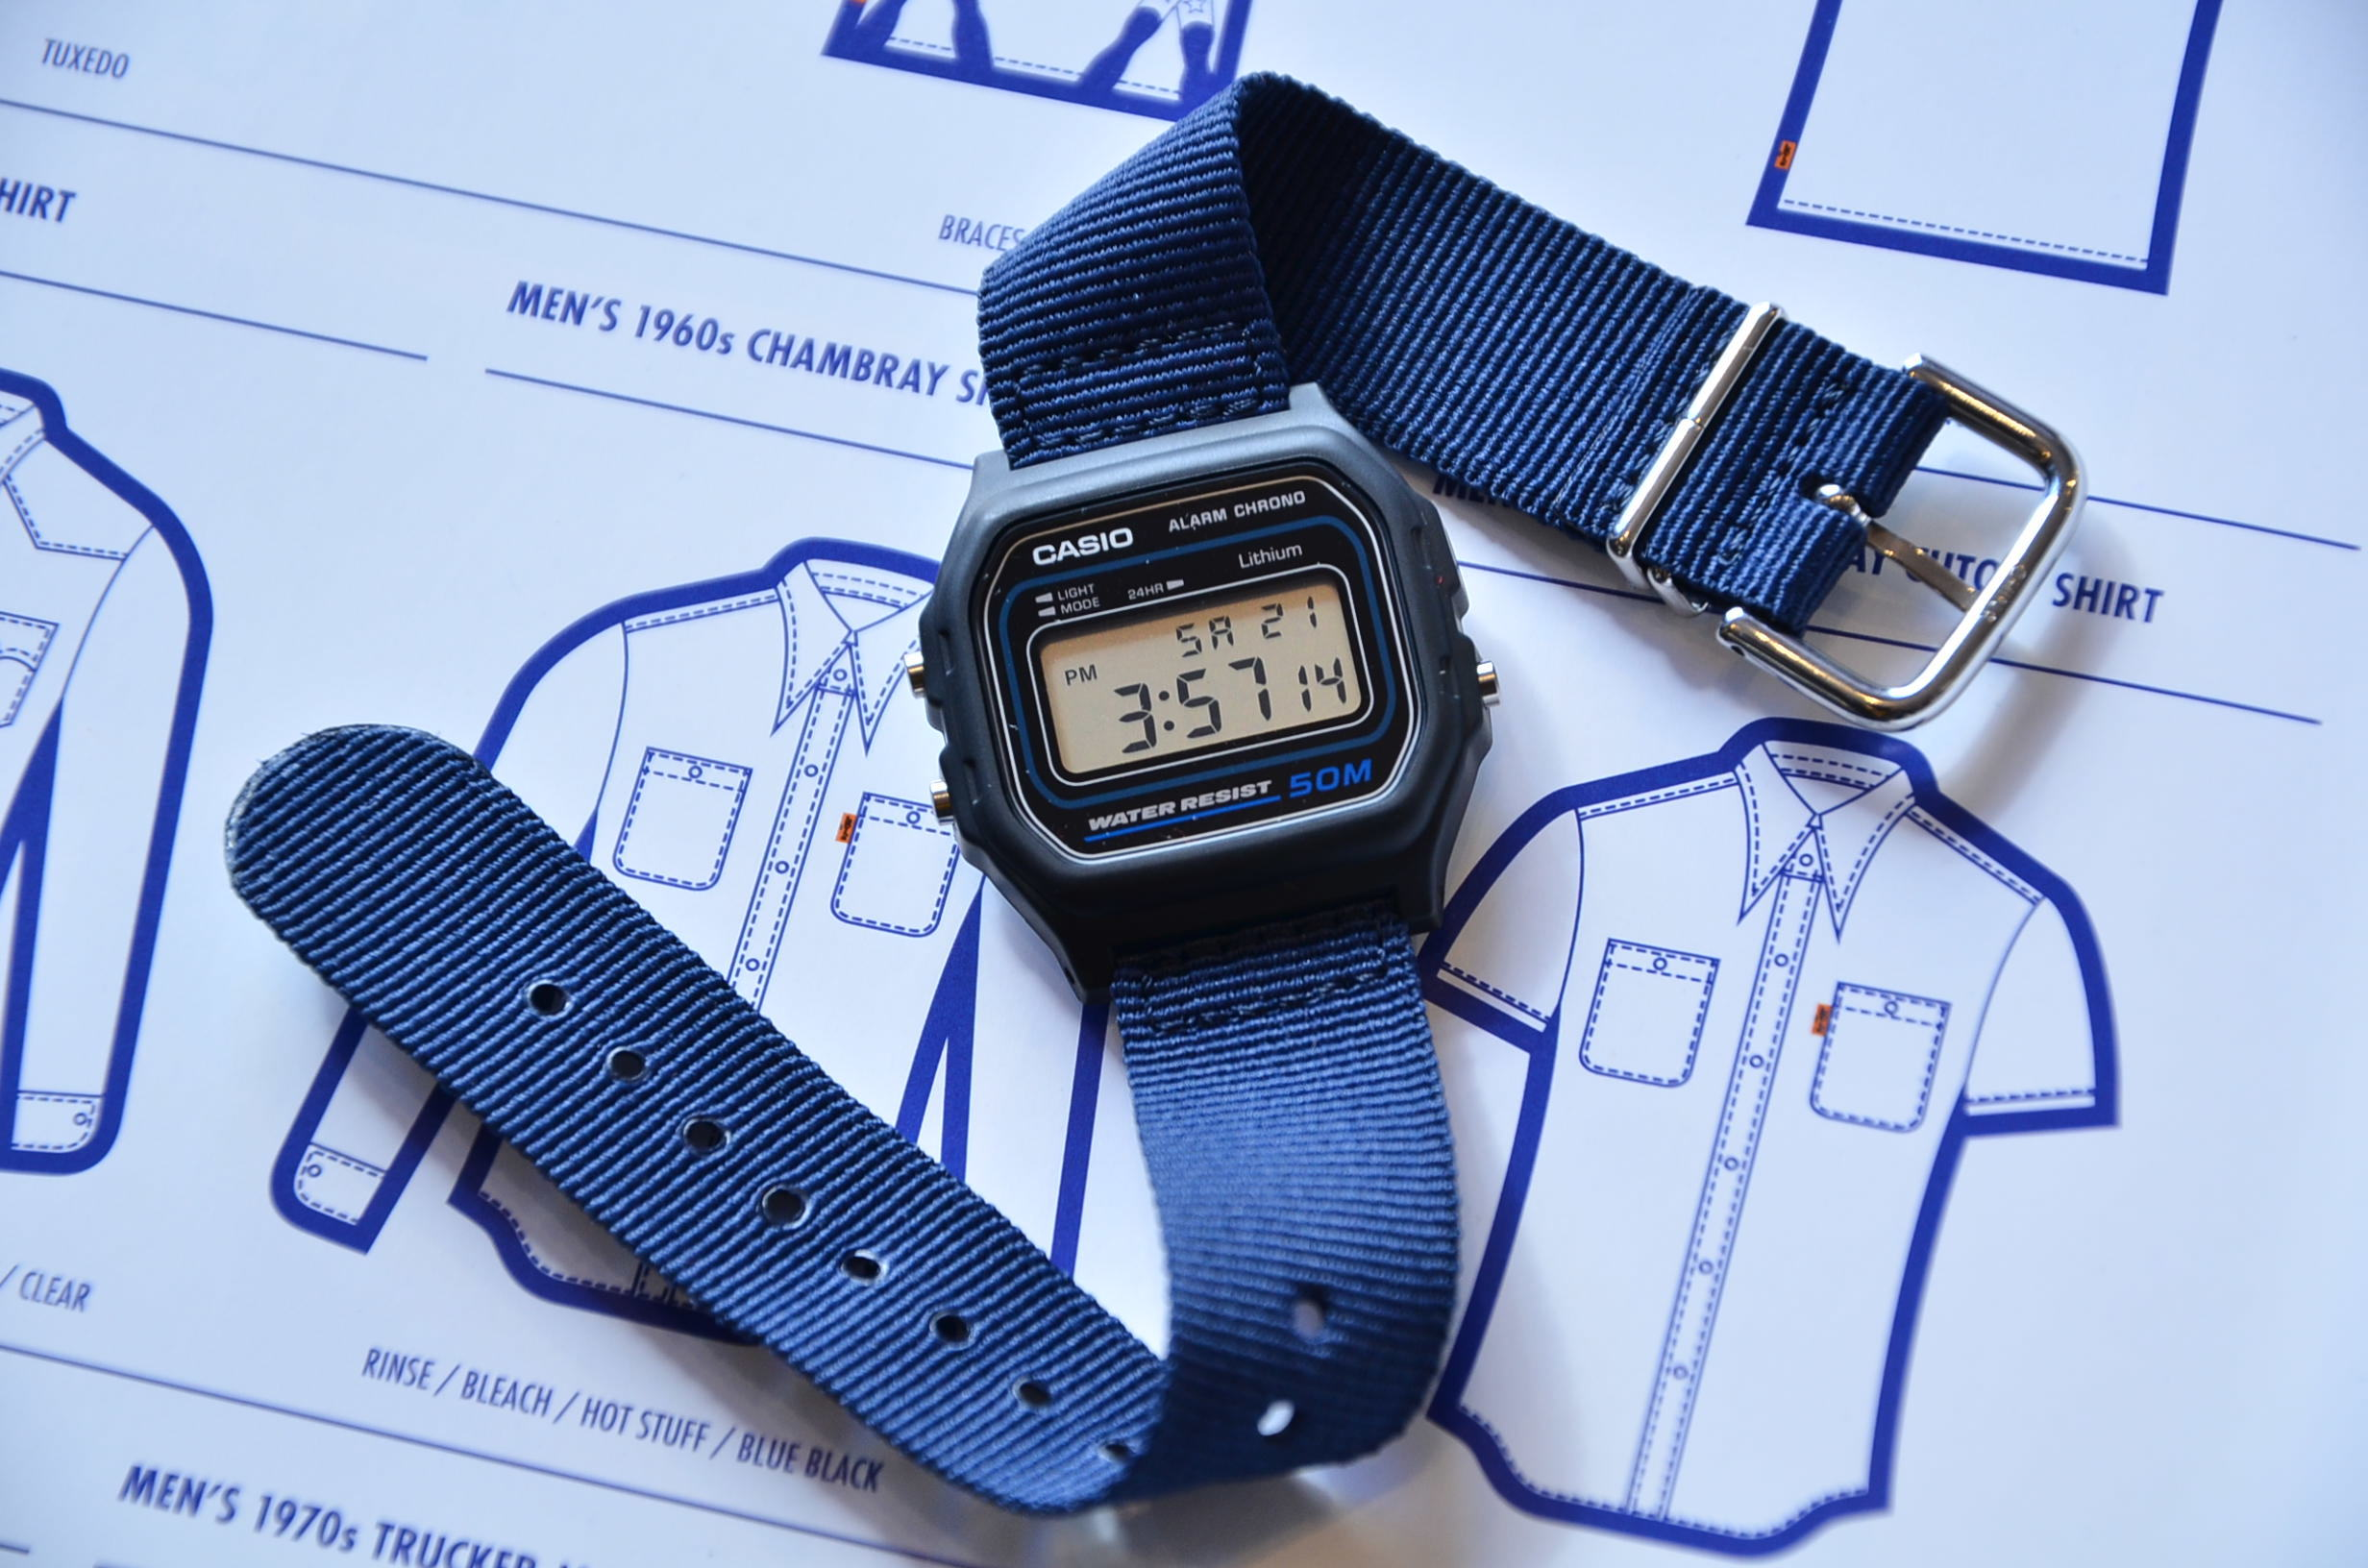 CASIOの時計!!!!_c0167336_18545360.jpg